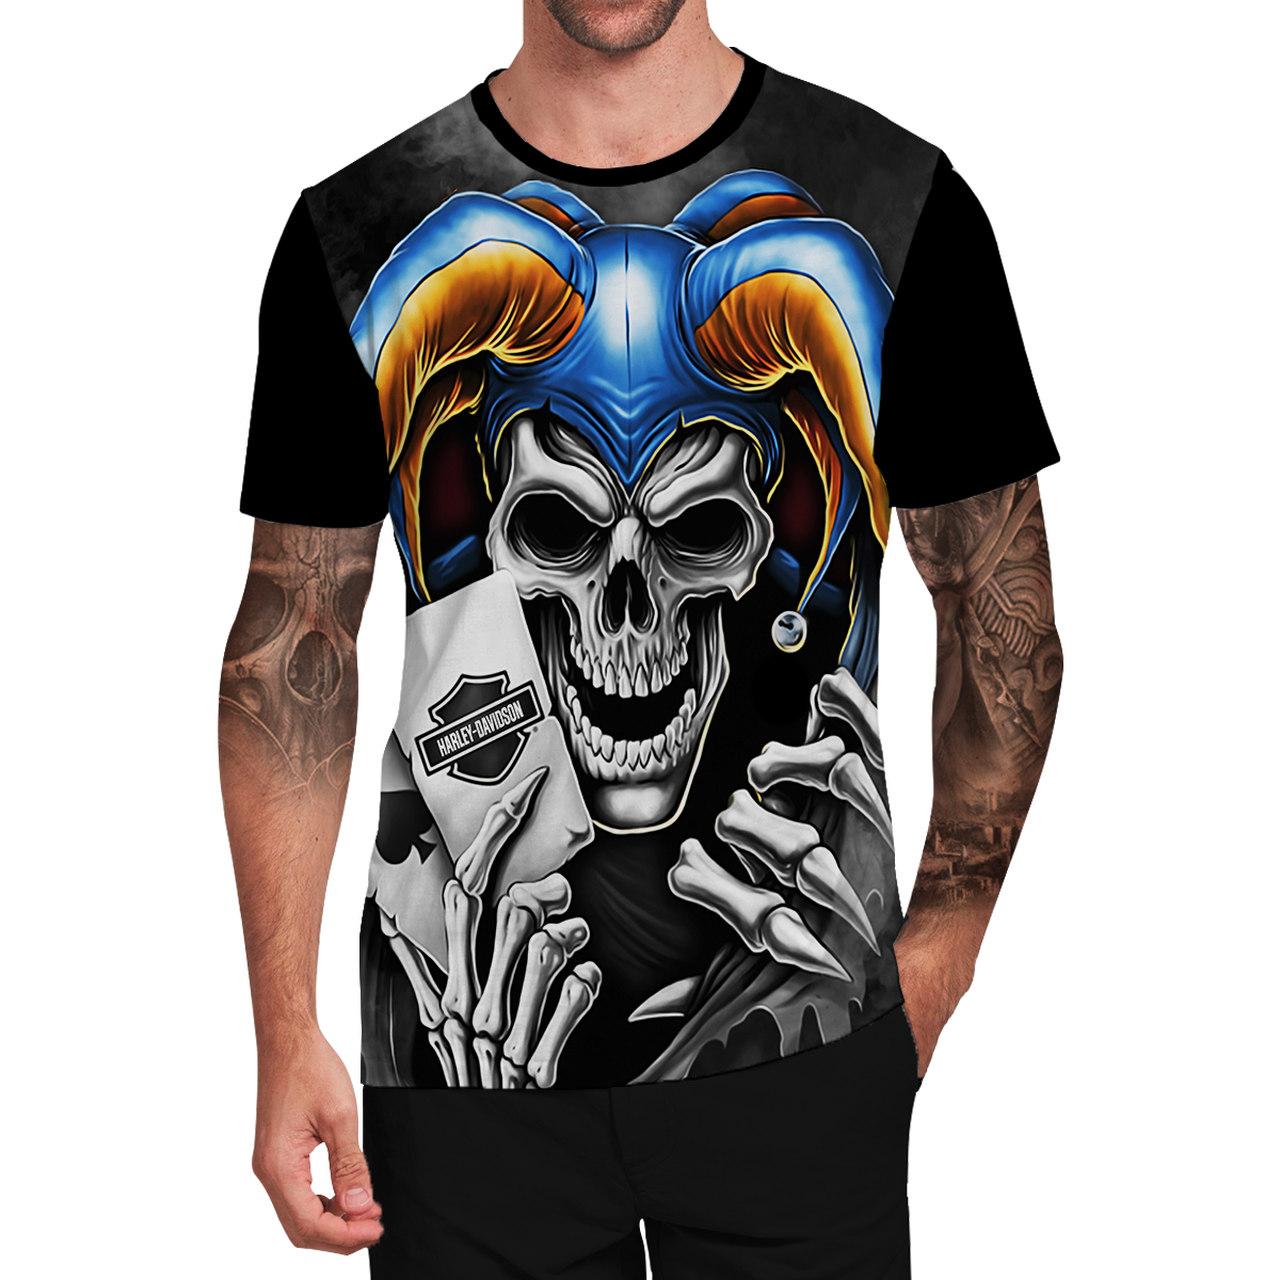 Stompy Camiseta Tattoo Tatuagem Caveira Skull 139